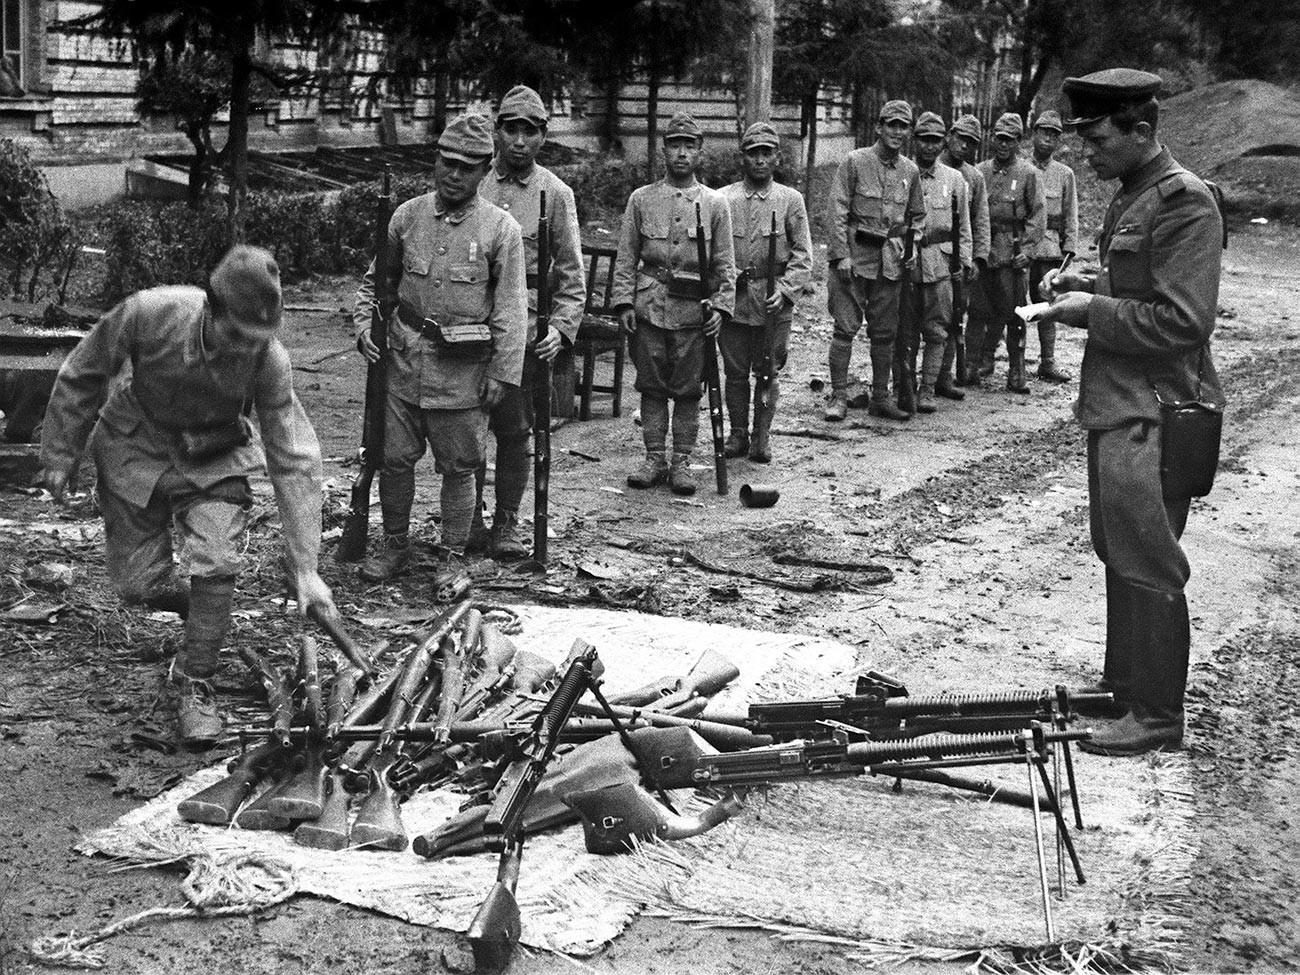 Drugi svjetski rat 1939.-1945. Kolovoz 1945. Slom imperijalističkog Japana. Mandžurska operacija od 9. kolovoza do 2. rujna 1945. Kapitulacija Kvantunške vojske.